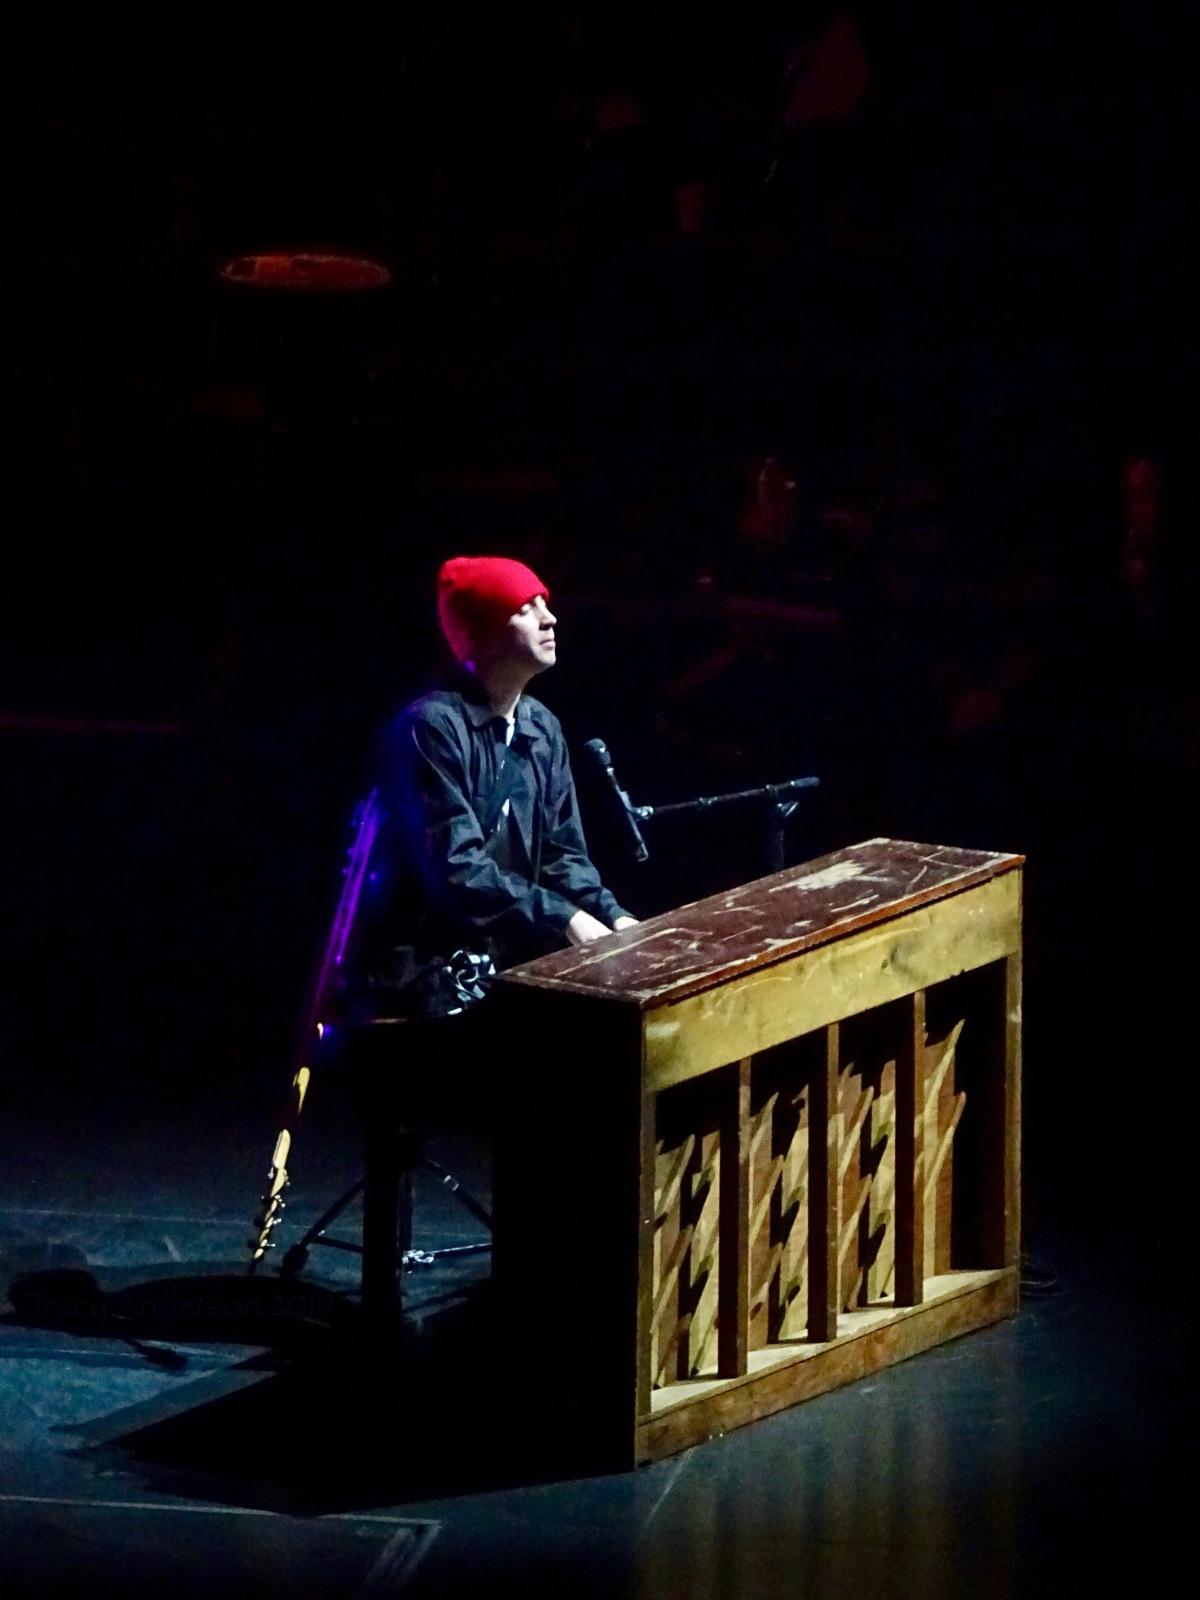 Tyler Joseph Piano Red Hat Twenty One Pilots Bandito Tour Scotiabank Saddledome Calgary May 14 2019